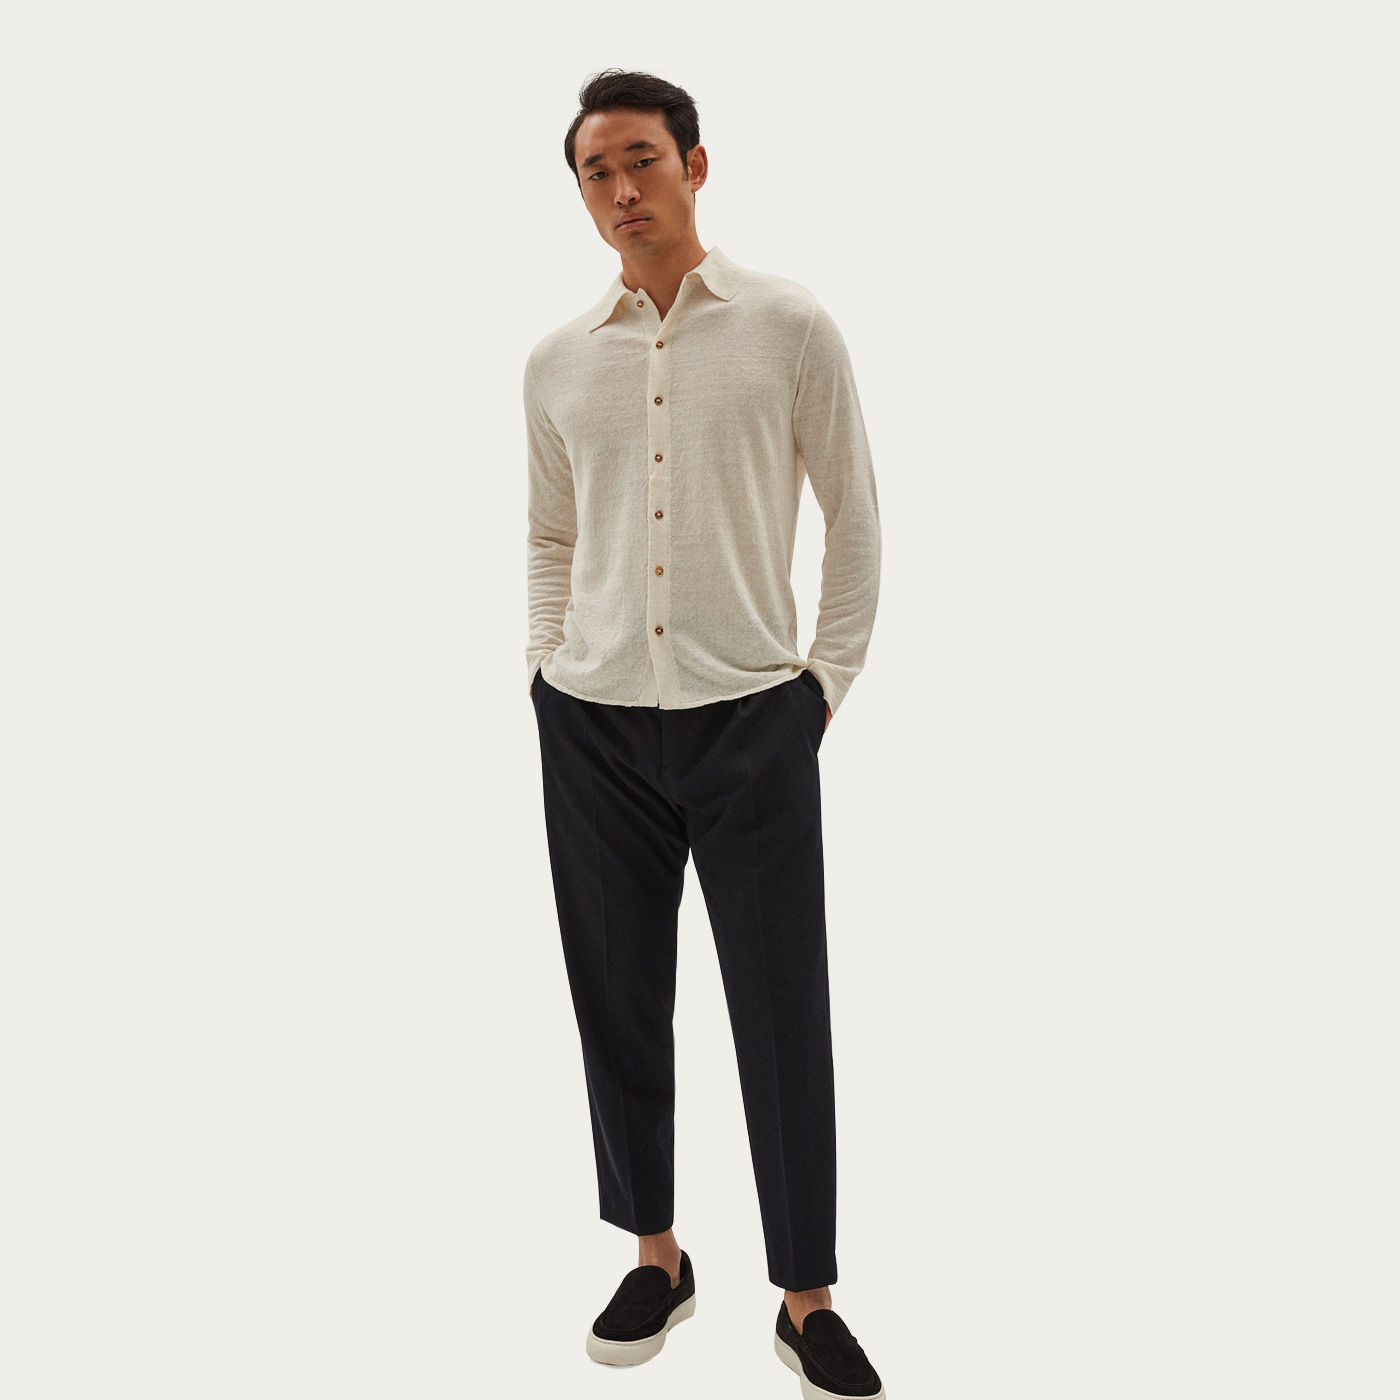 Ivory Linen Knit Cardigan Shirt | Bombinate